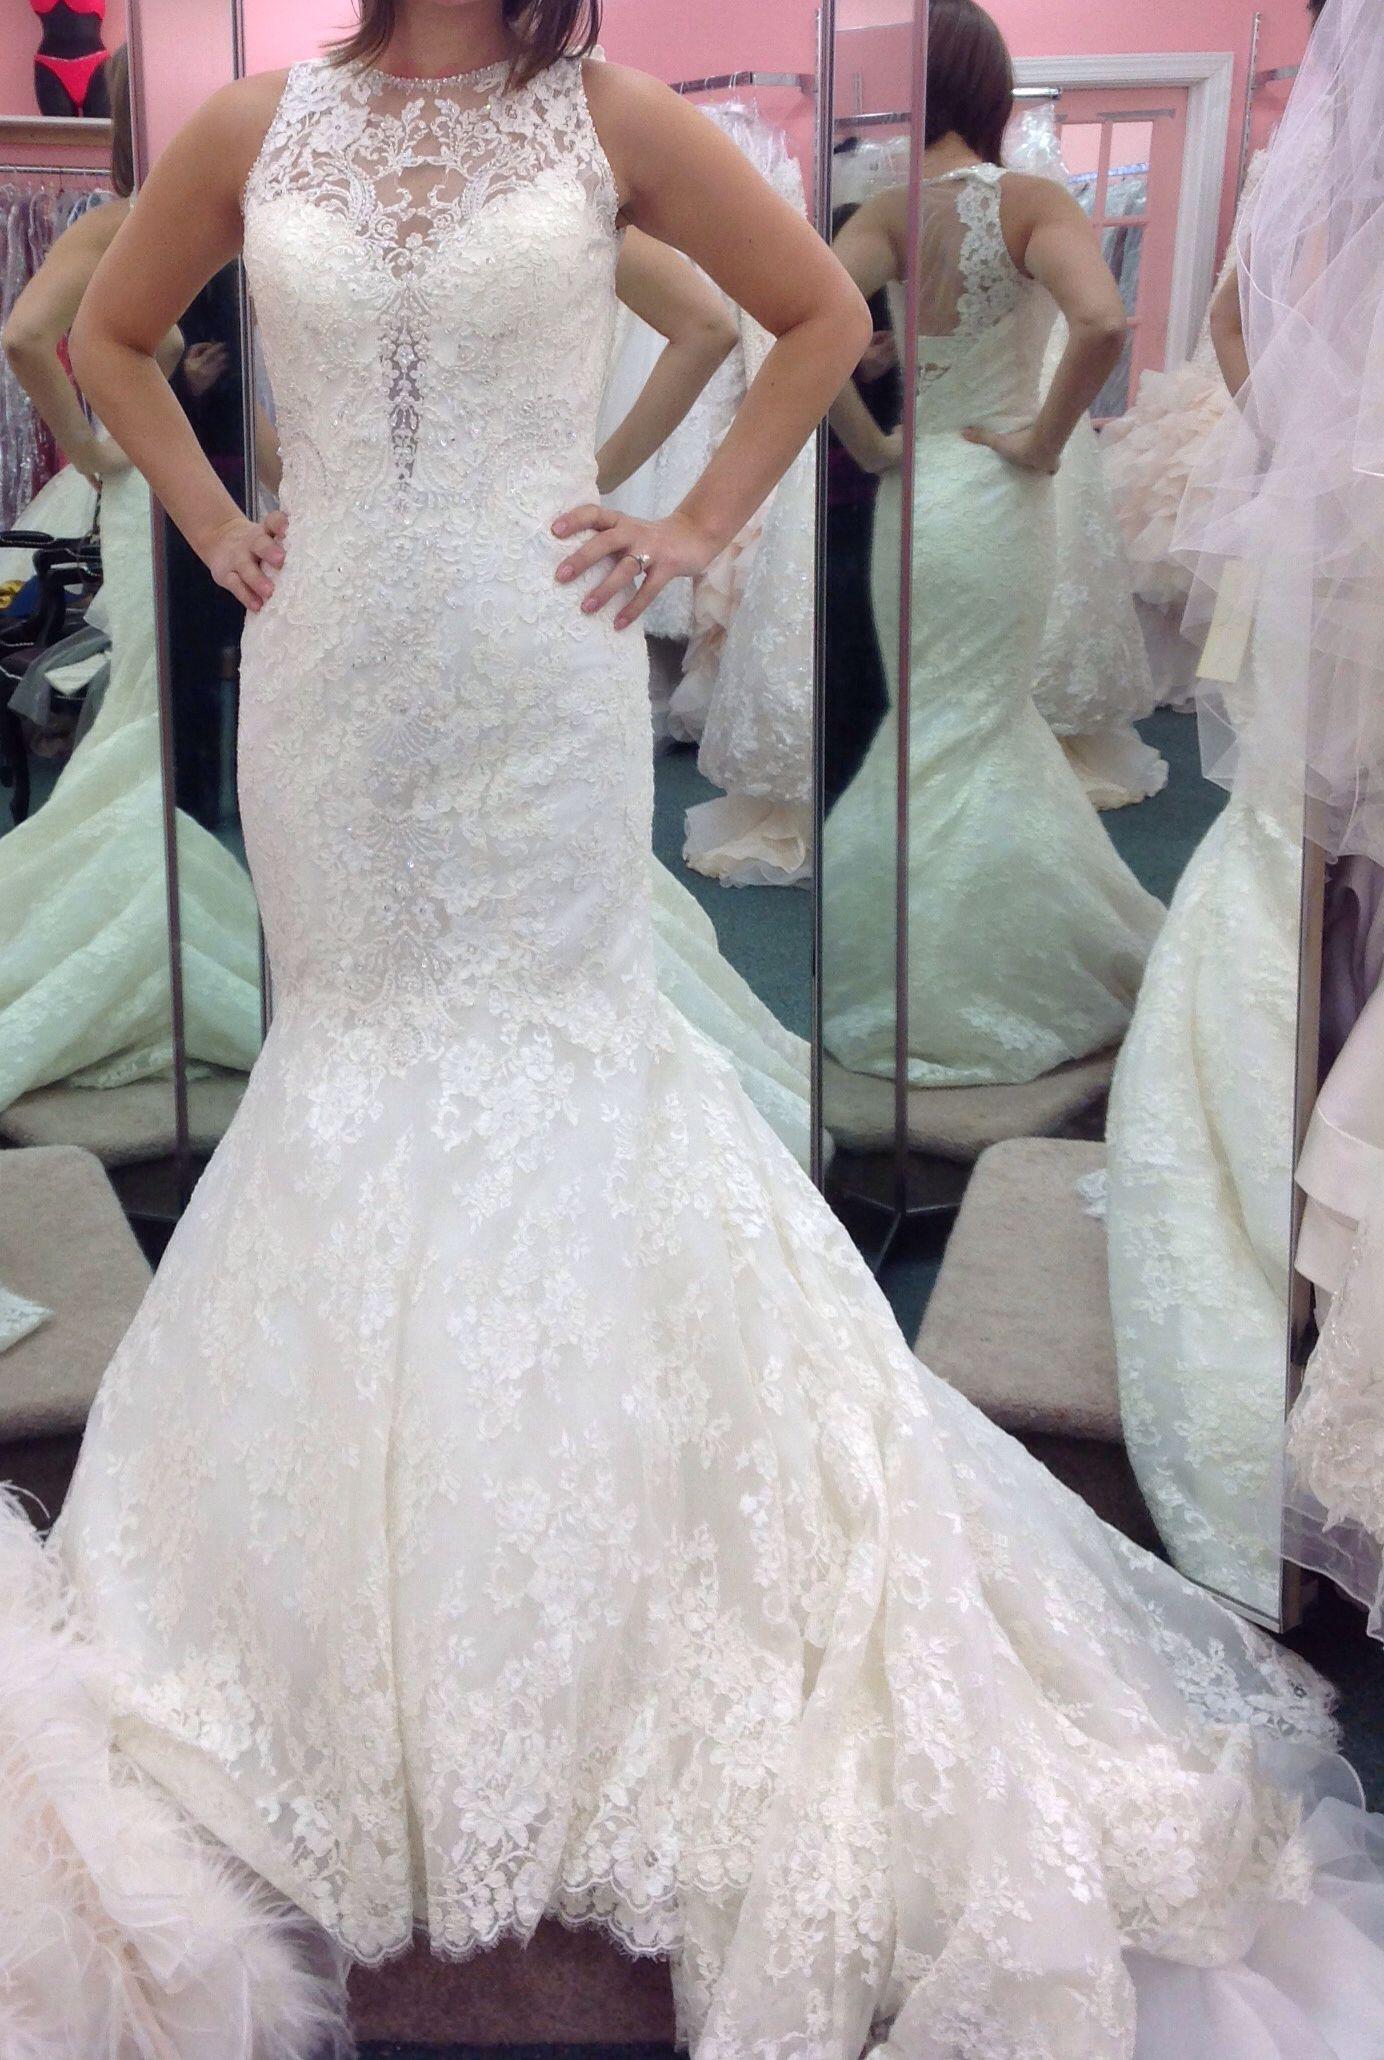 Allure C280 Dress On A Real Bride Dresses Wedding Dresses Mermaid Wedding Dress [ 2060 x 1384 Pixel ]